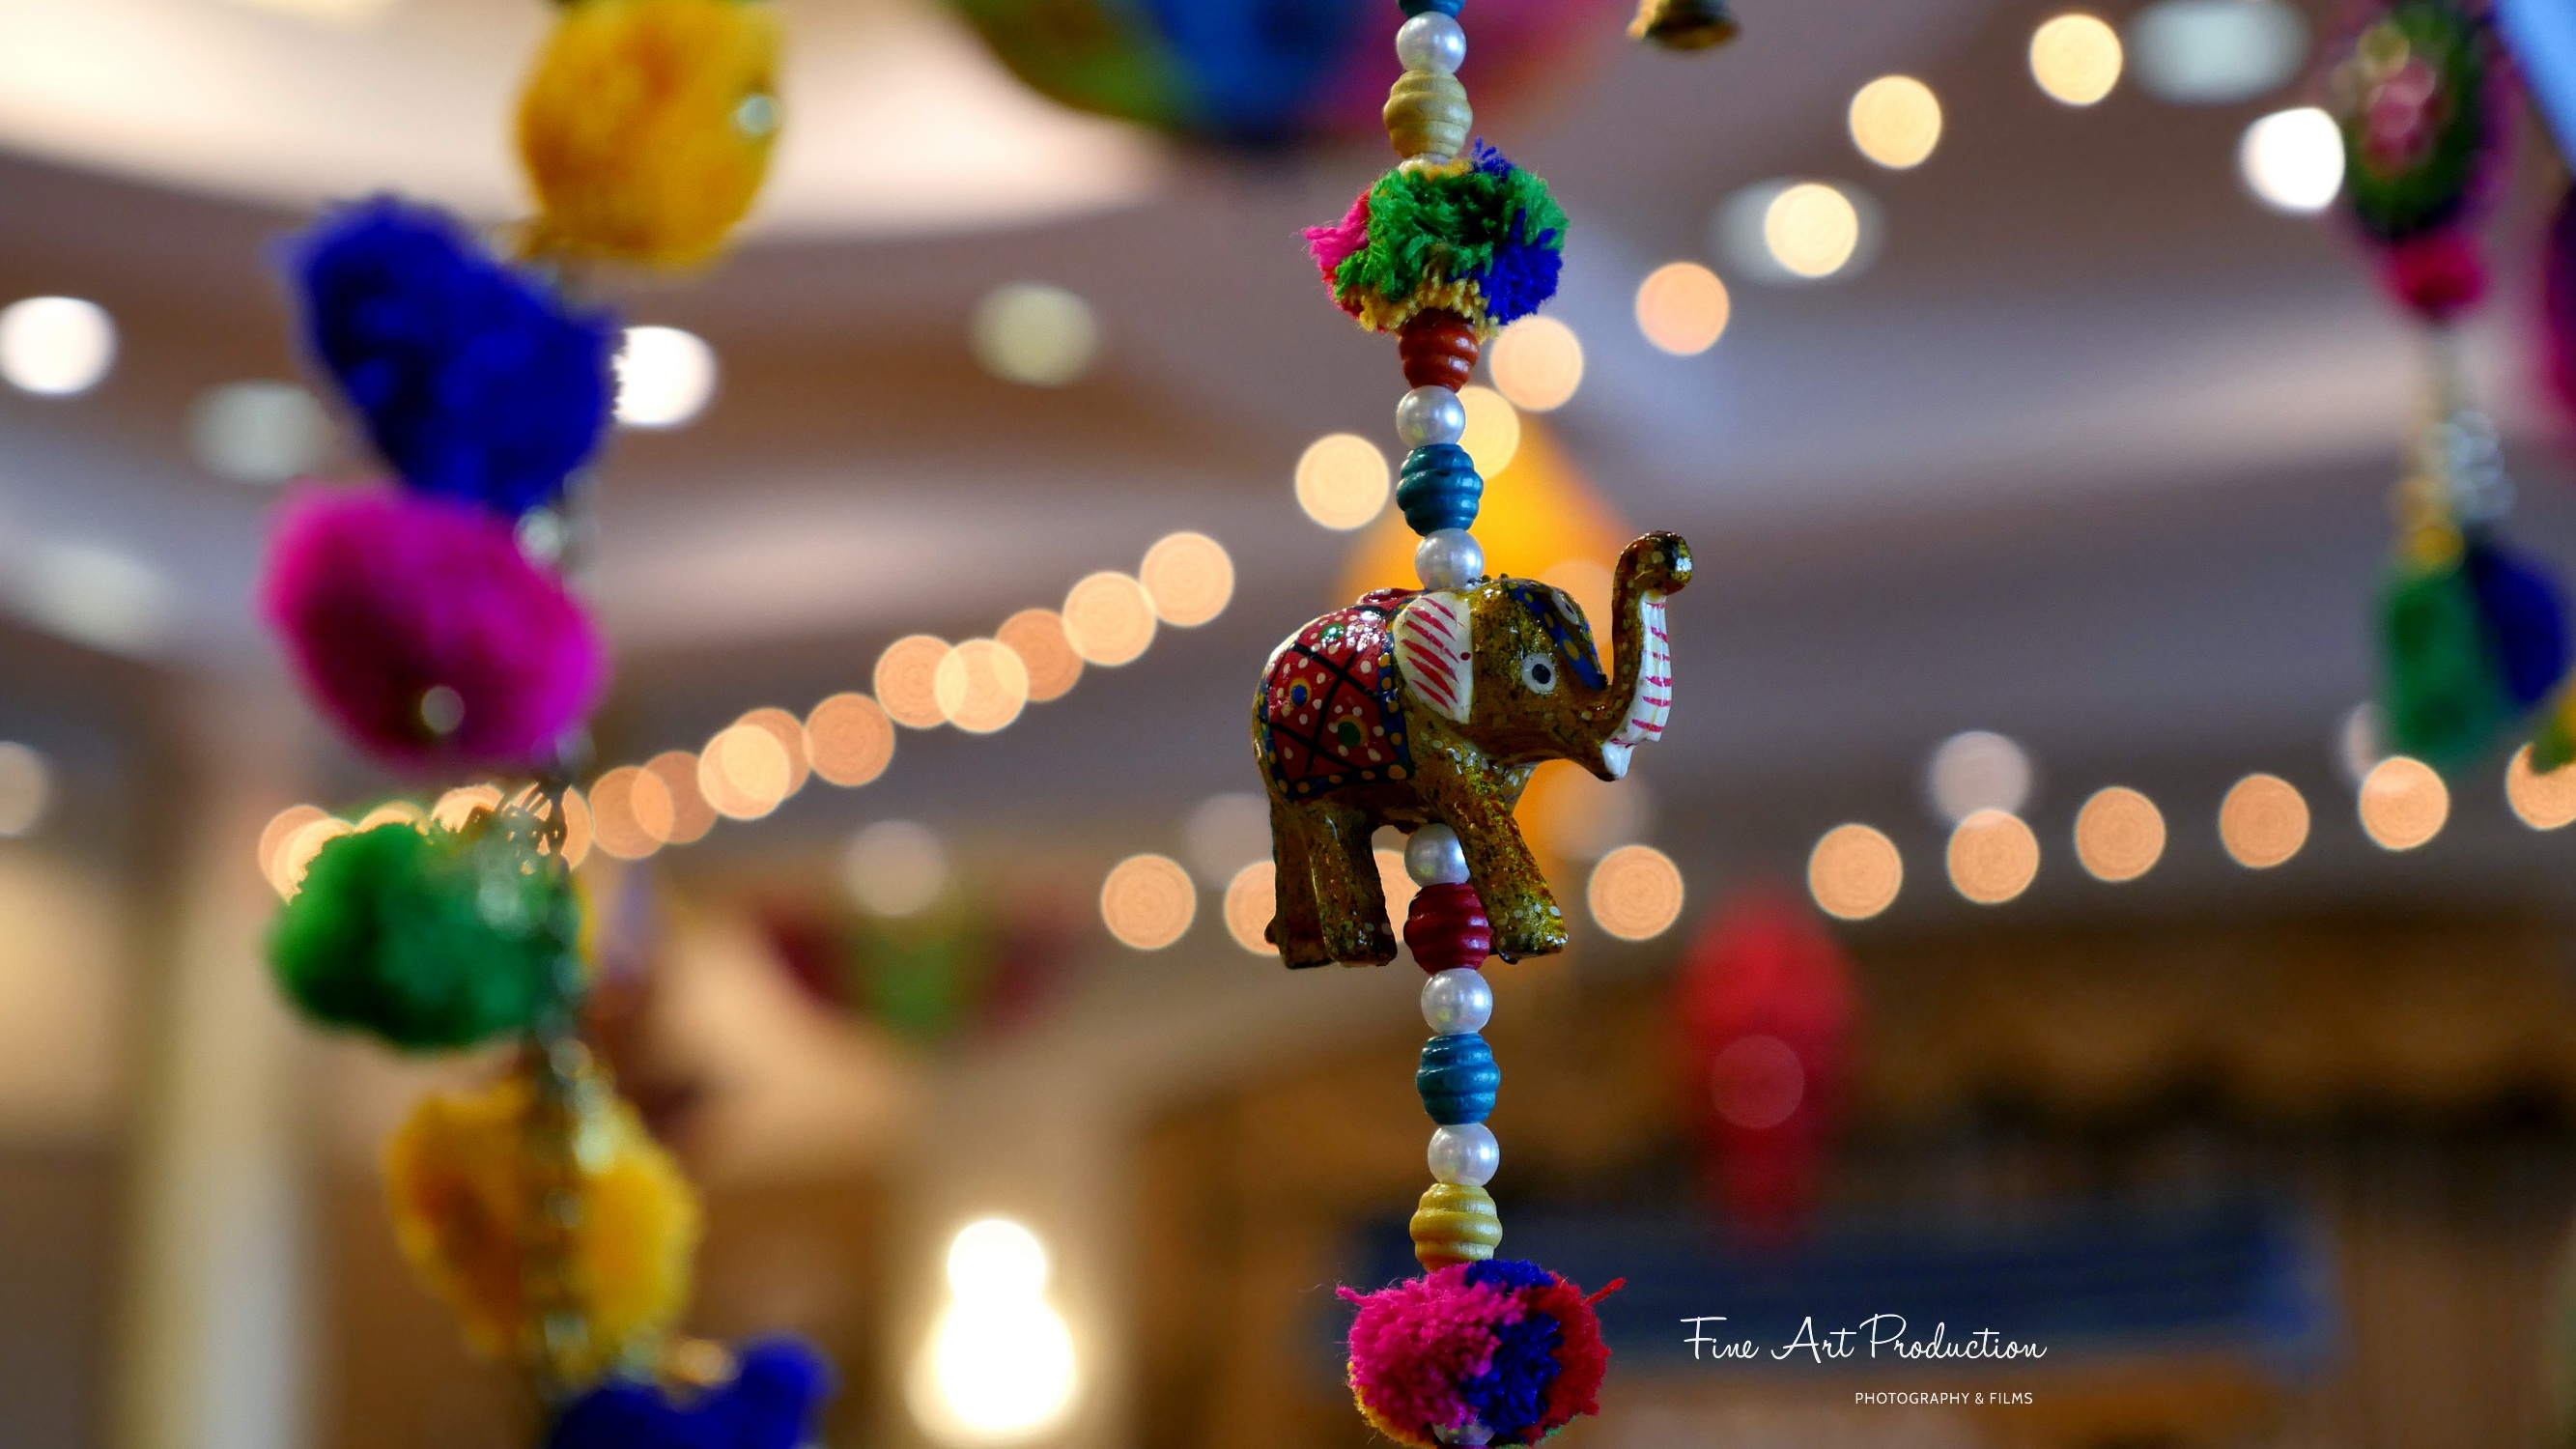 india-wedding-photographer-fine-art-production-chirali-amish-thakkar_0060